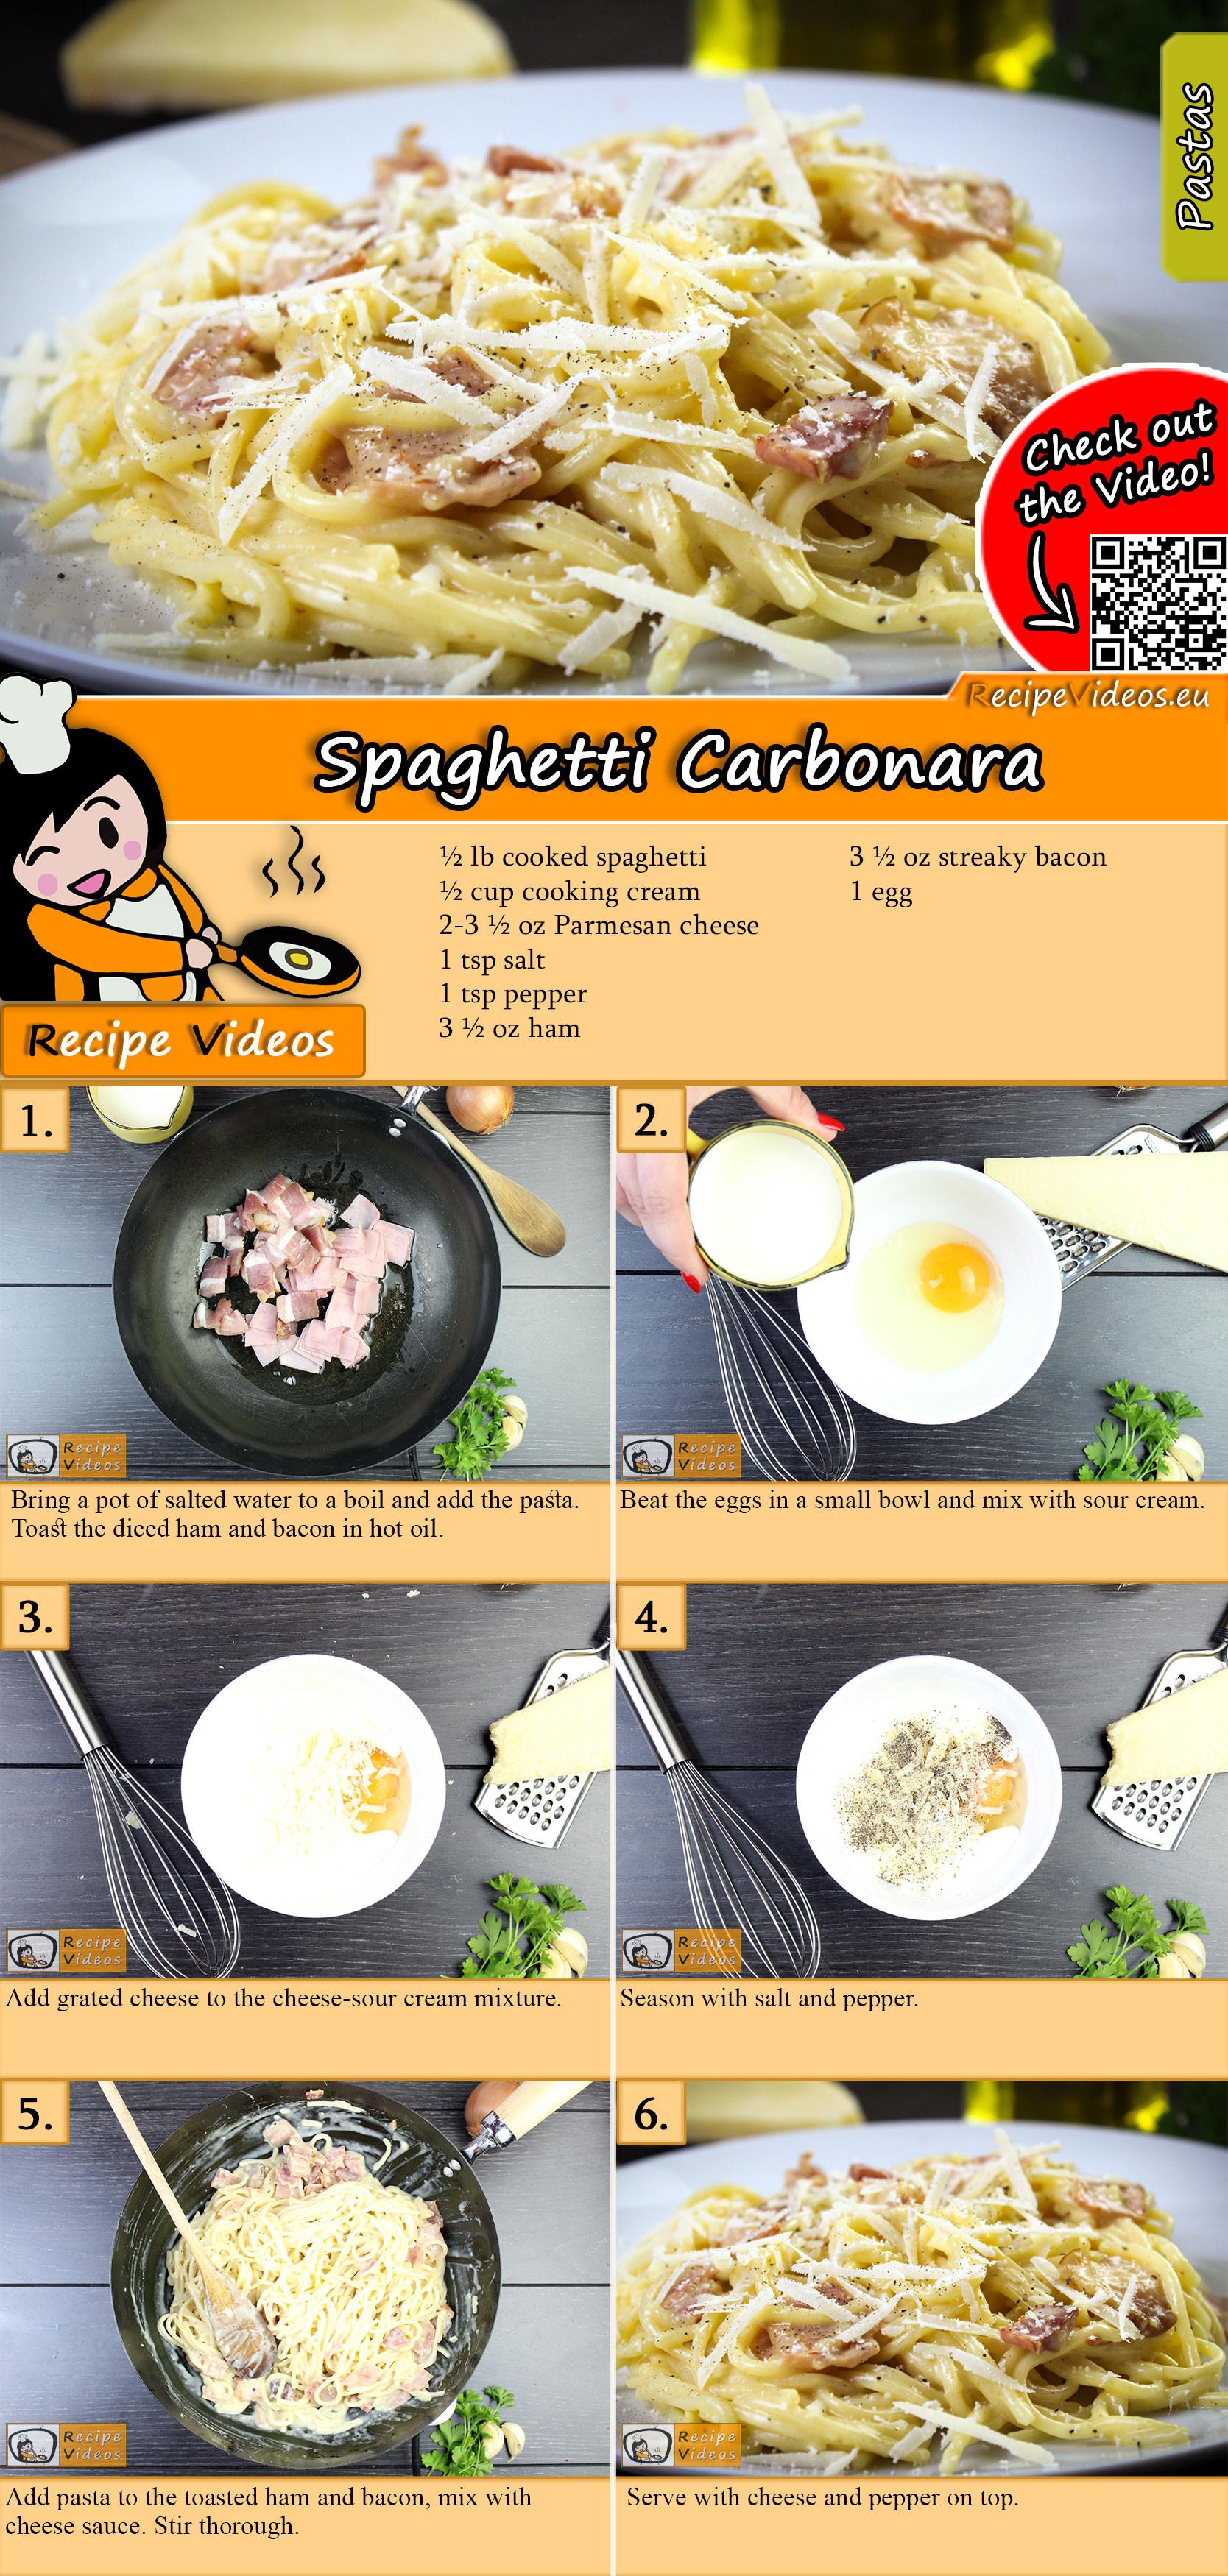 Spaghetti carbonara recipe with video